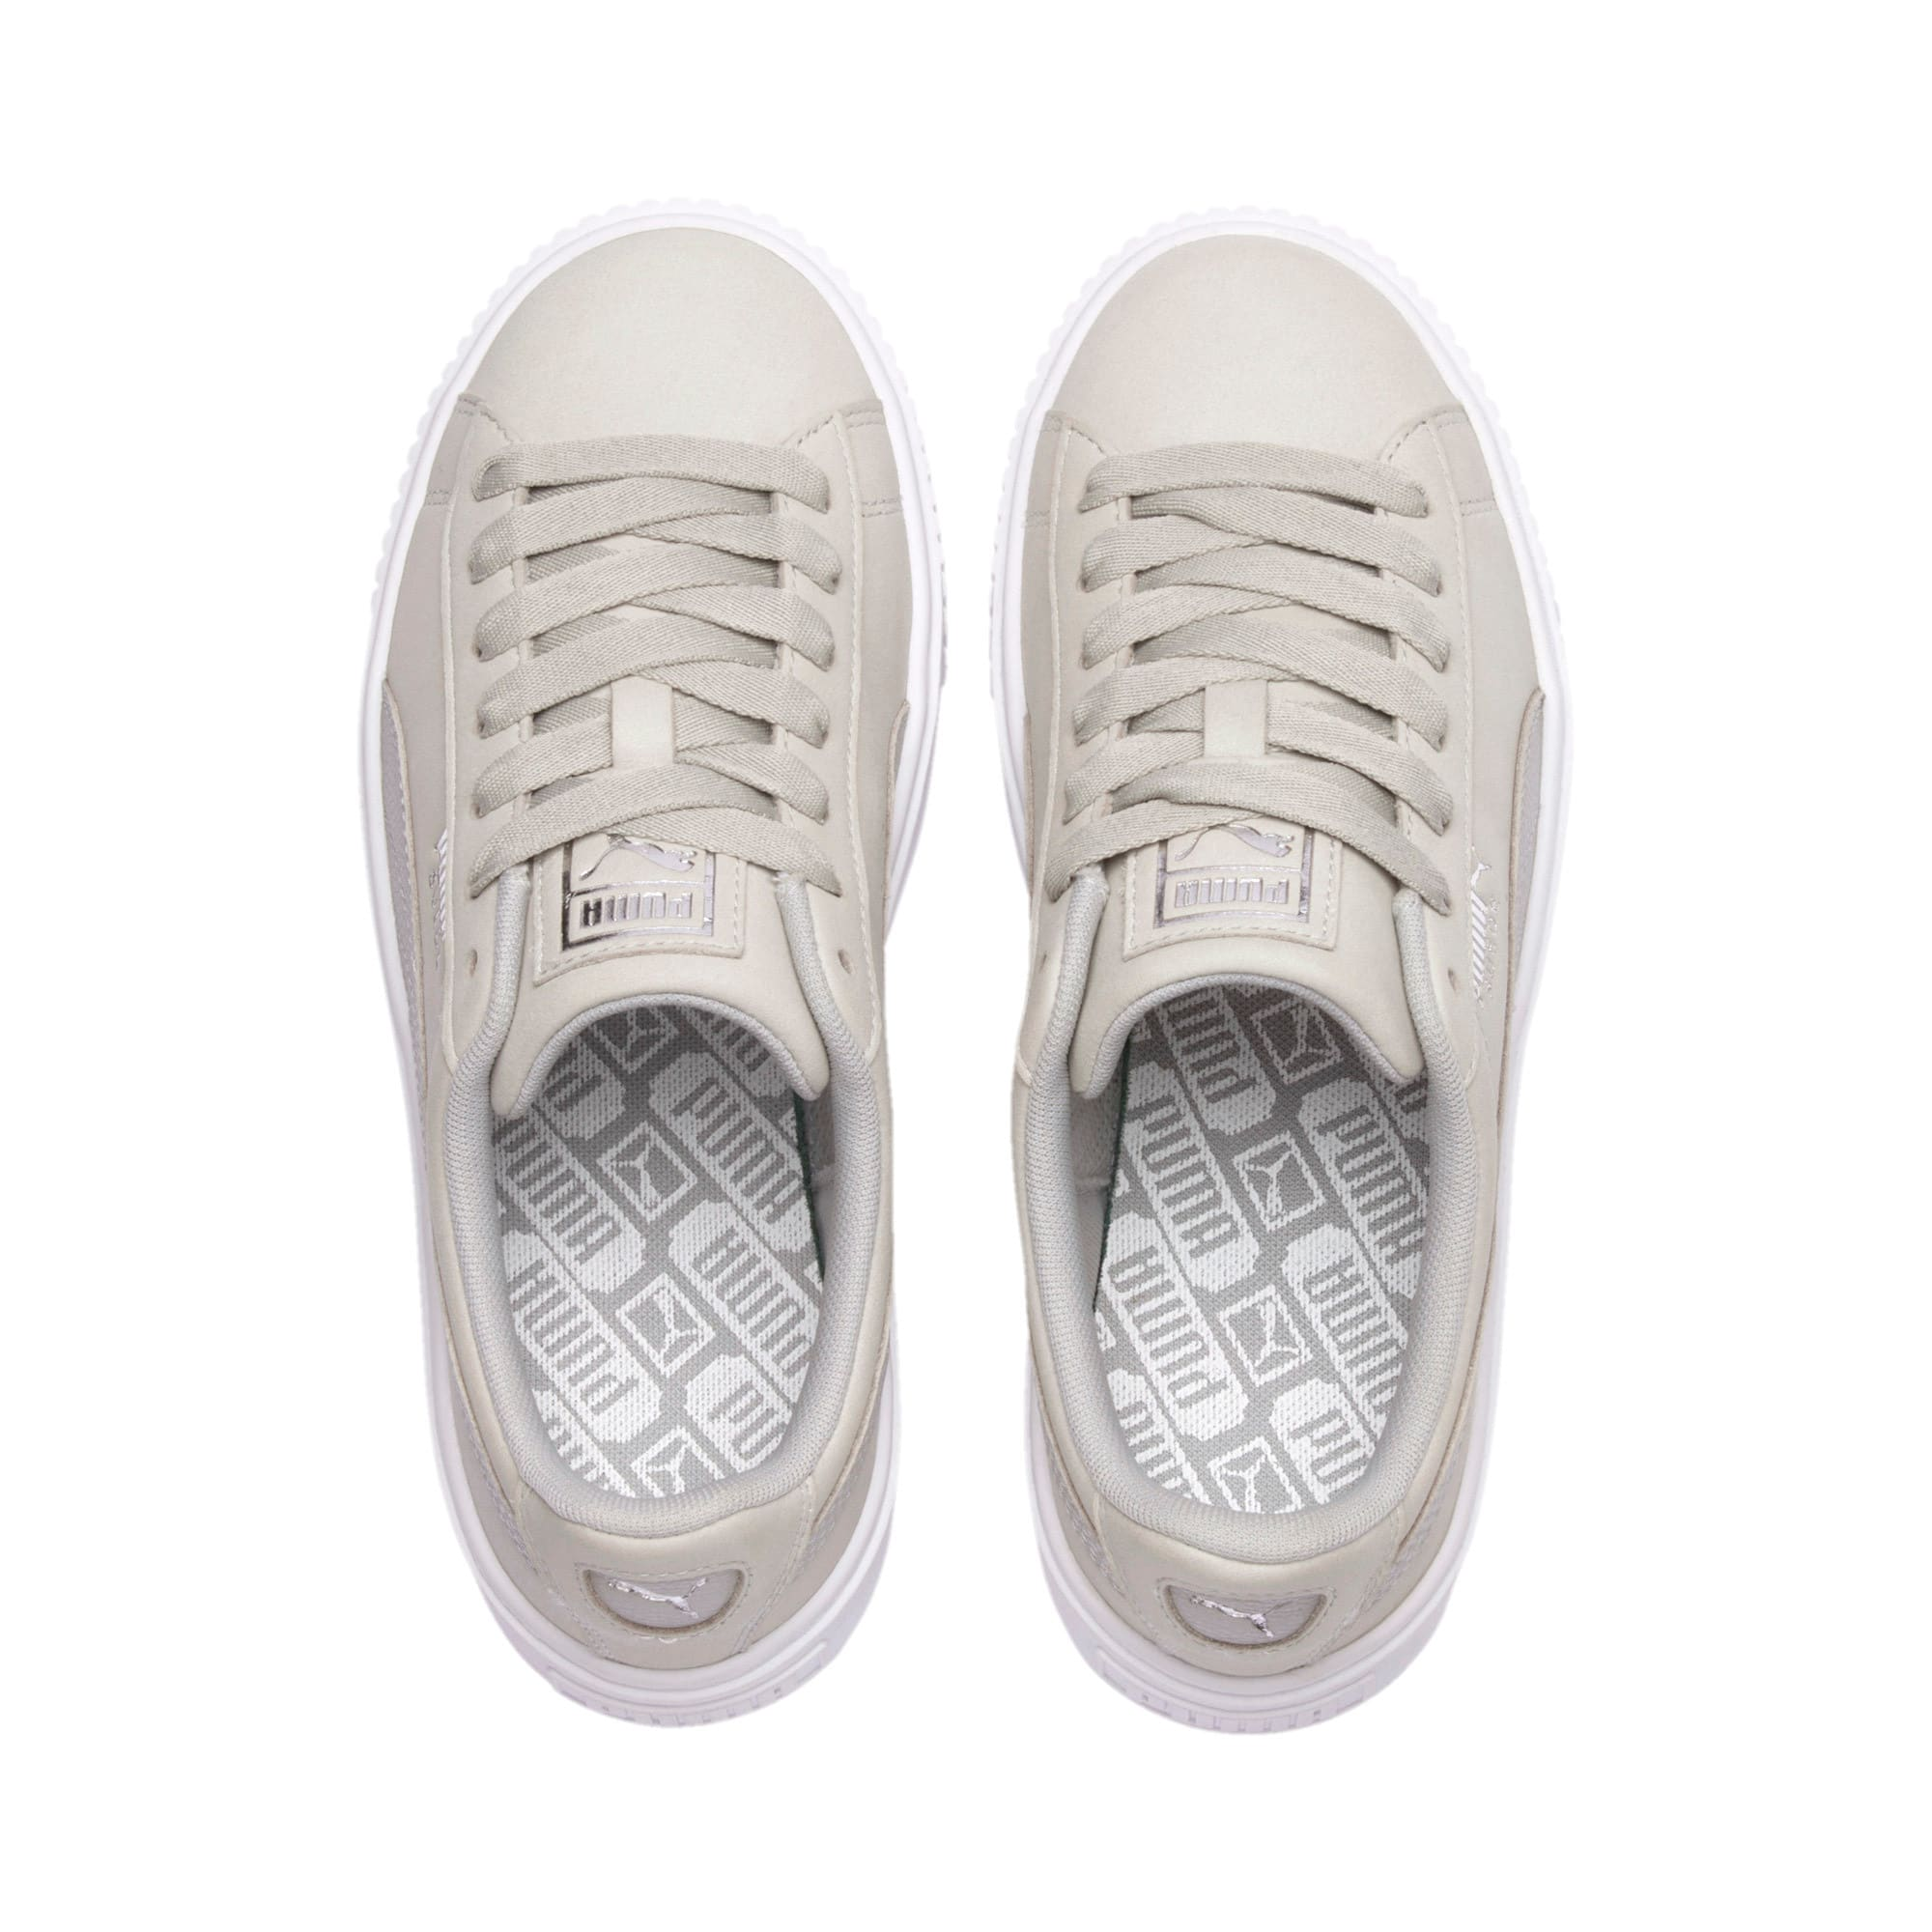 Thumbnail 7 of Suede Platform Shimmer Women's Sneakers, Gray Violet-Puma White, medium